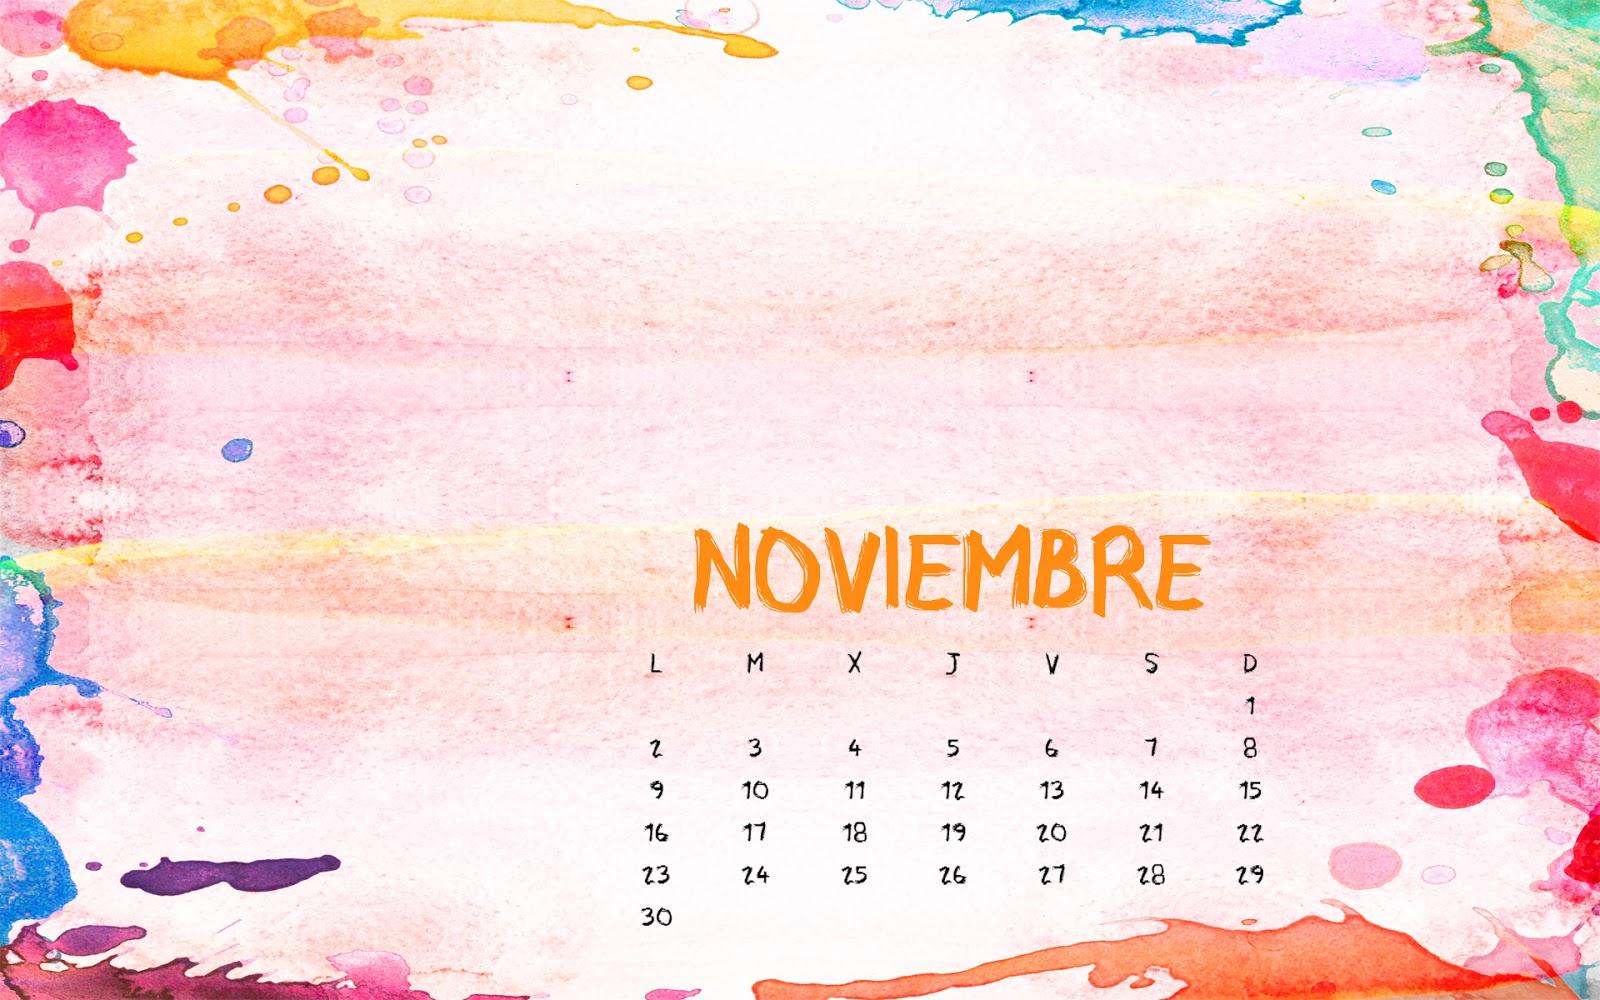 Mi Dulce De Melocoton: Fondo De Pantalla: Noviembre'15